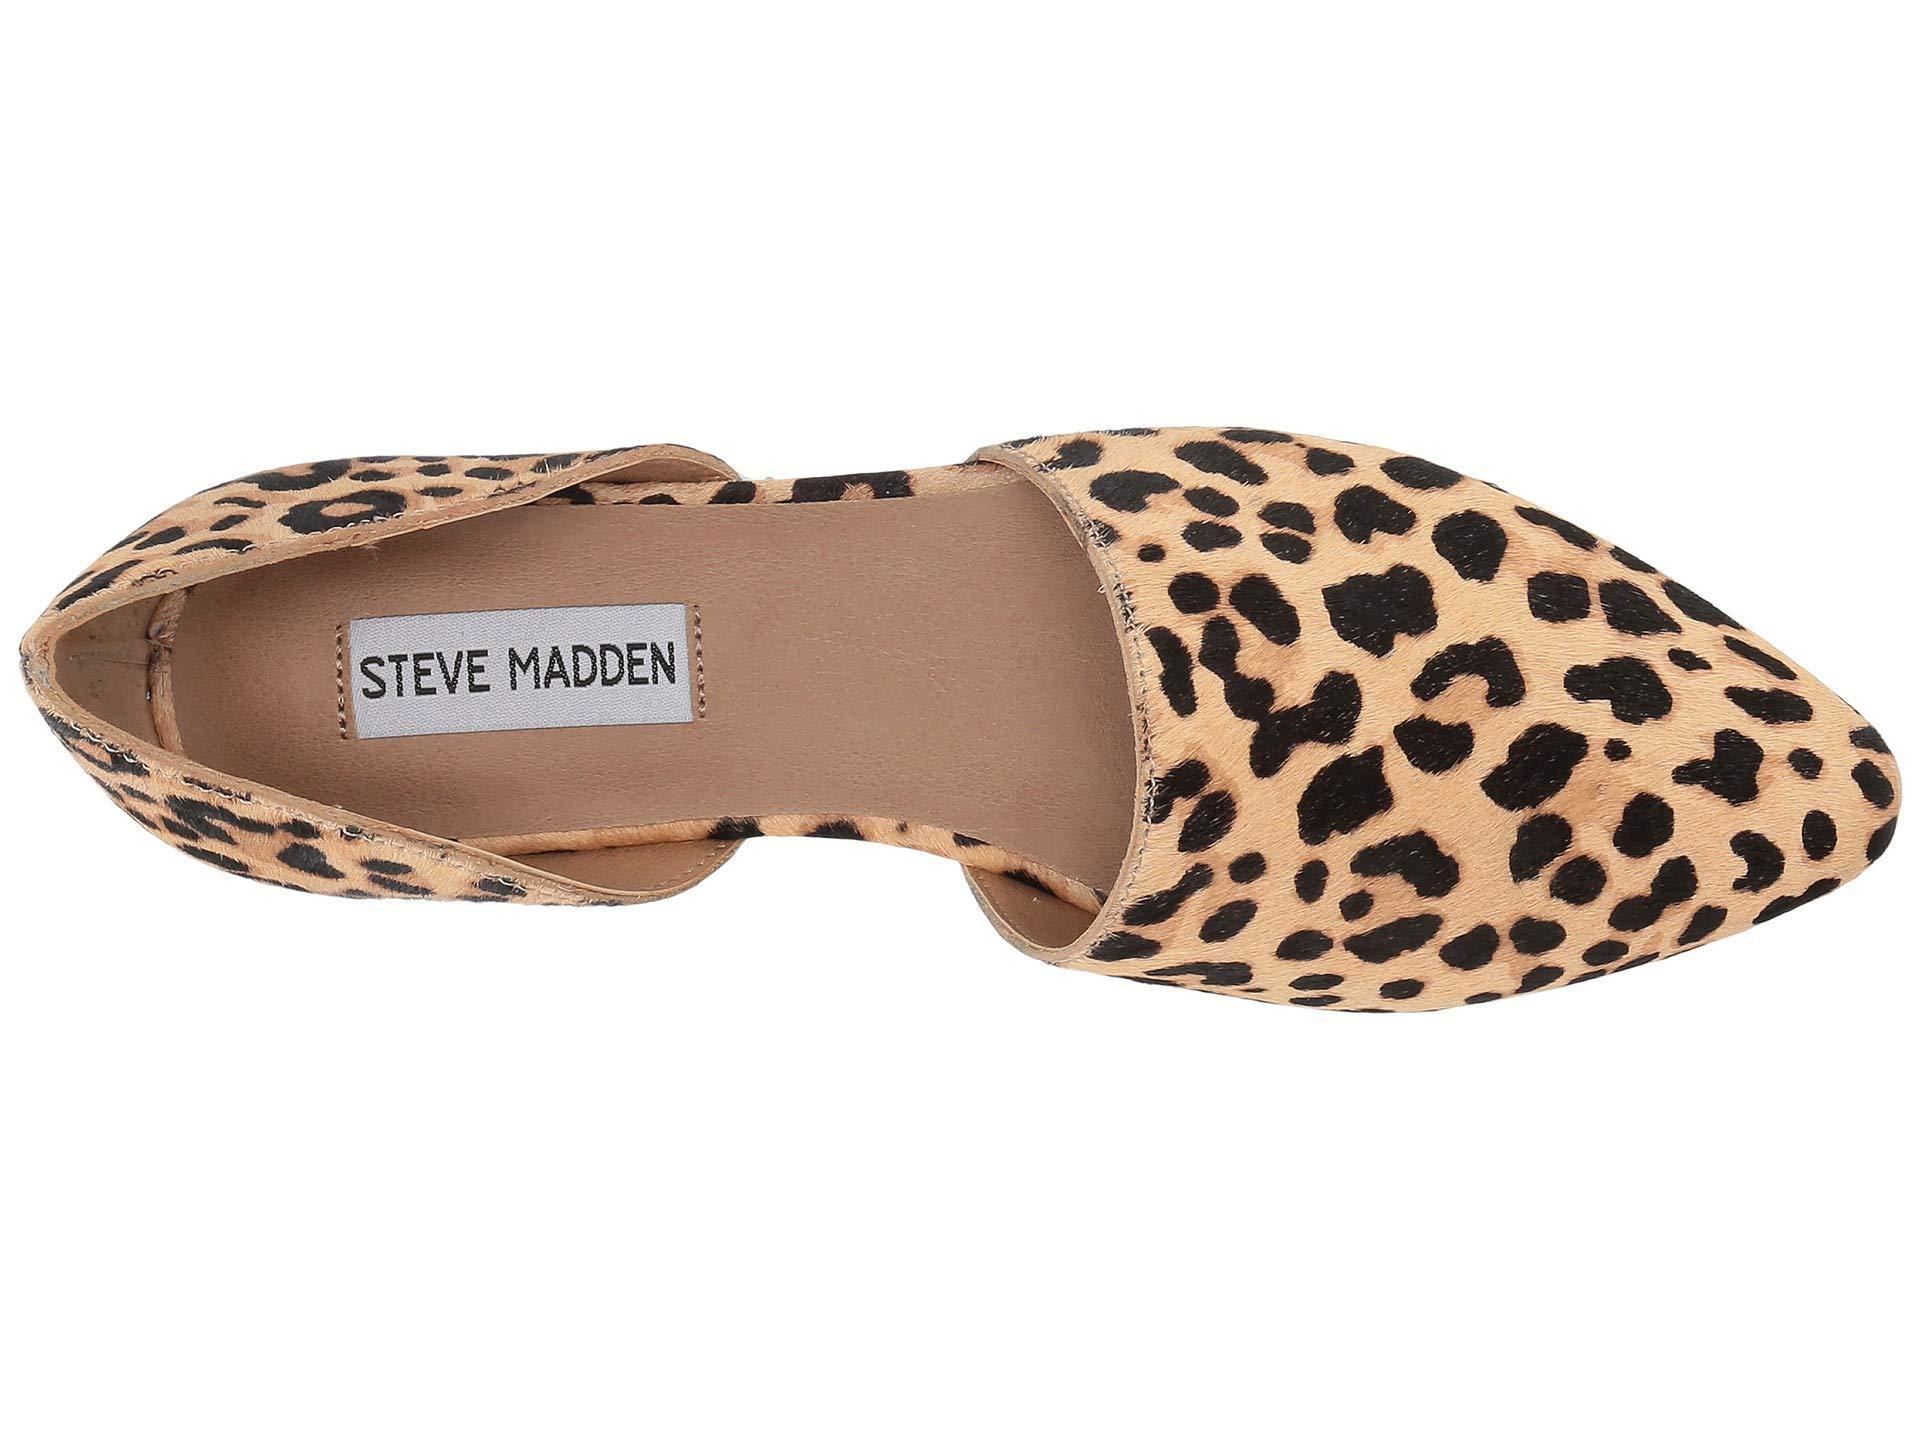 ba832f100db Steve Madden - Multicolor Talent-l Flat (leopard) Women s Shoes - Lyst.  View fullscreen